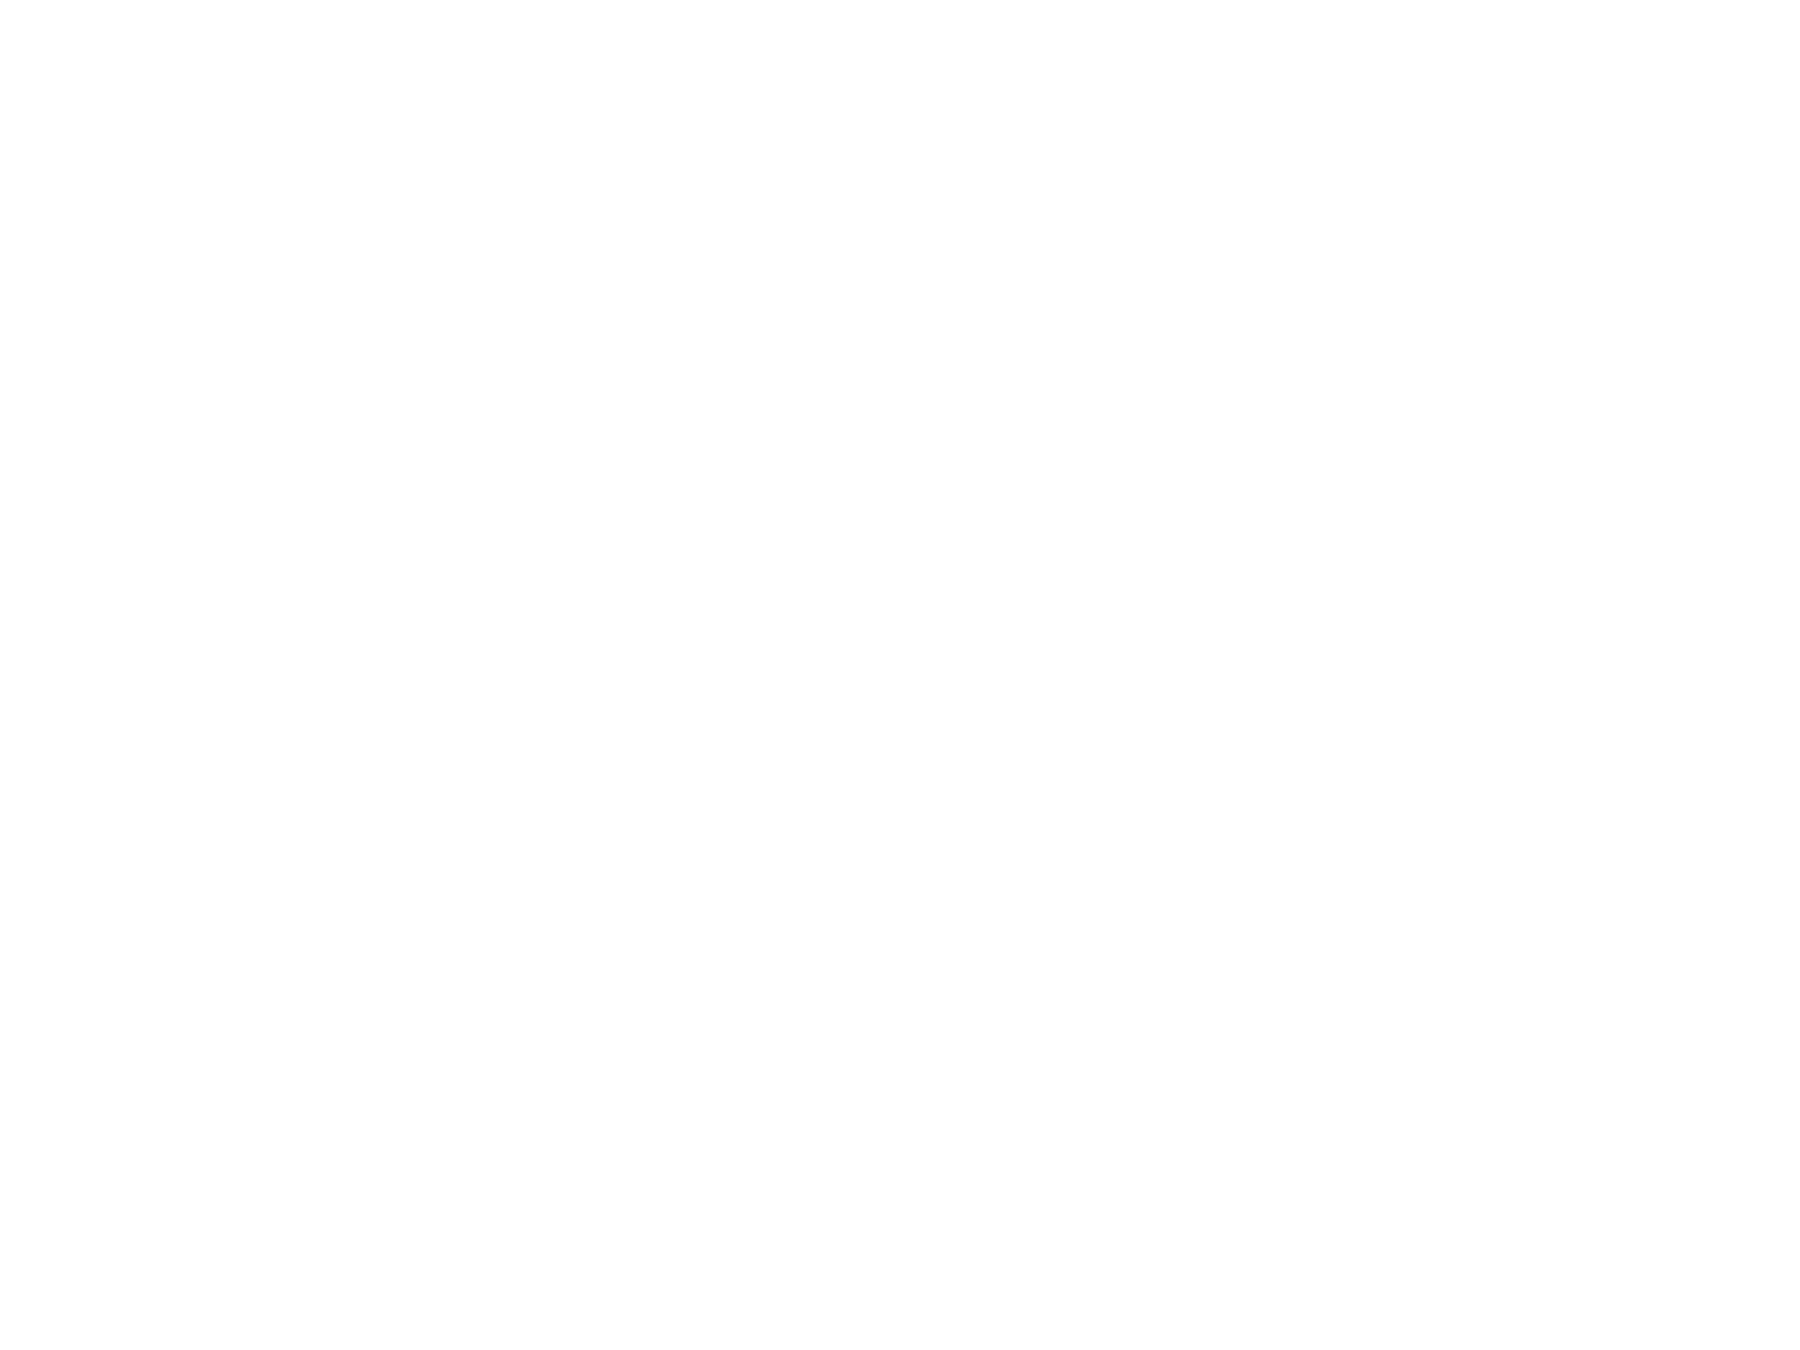 Rebranding Rotter Glas Germany